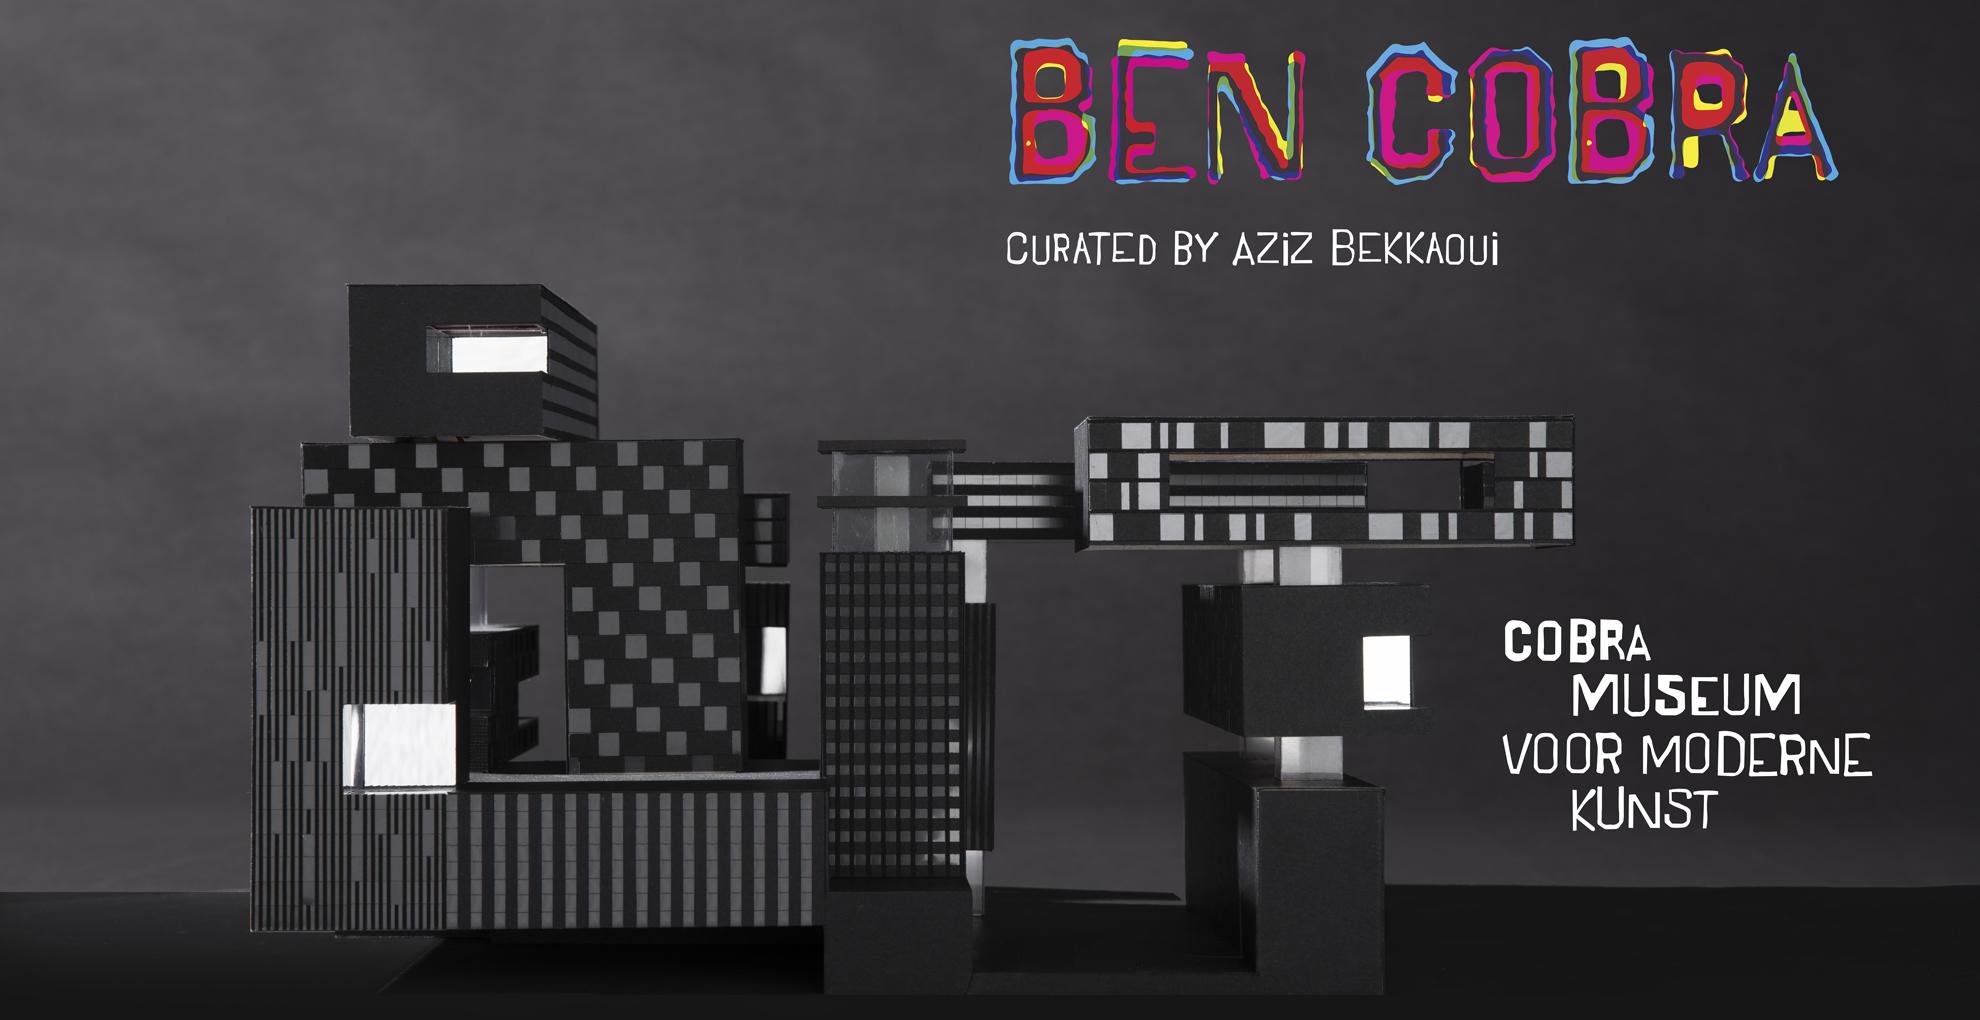 Ben Cobra exhibition